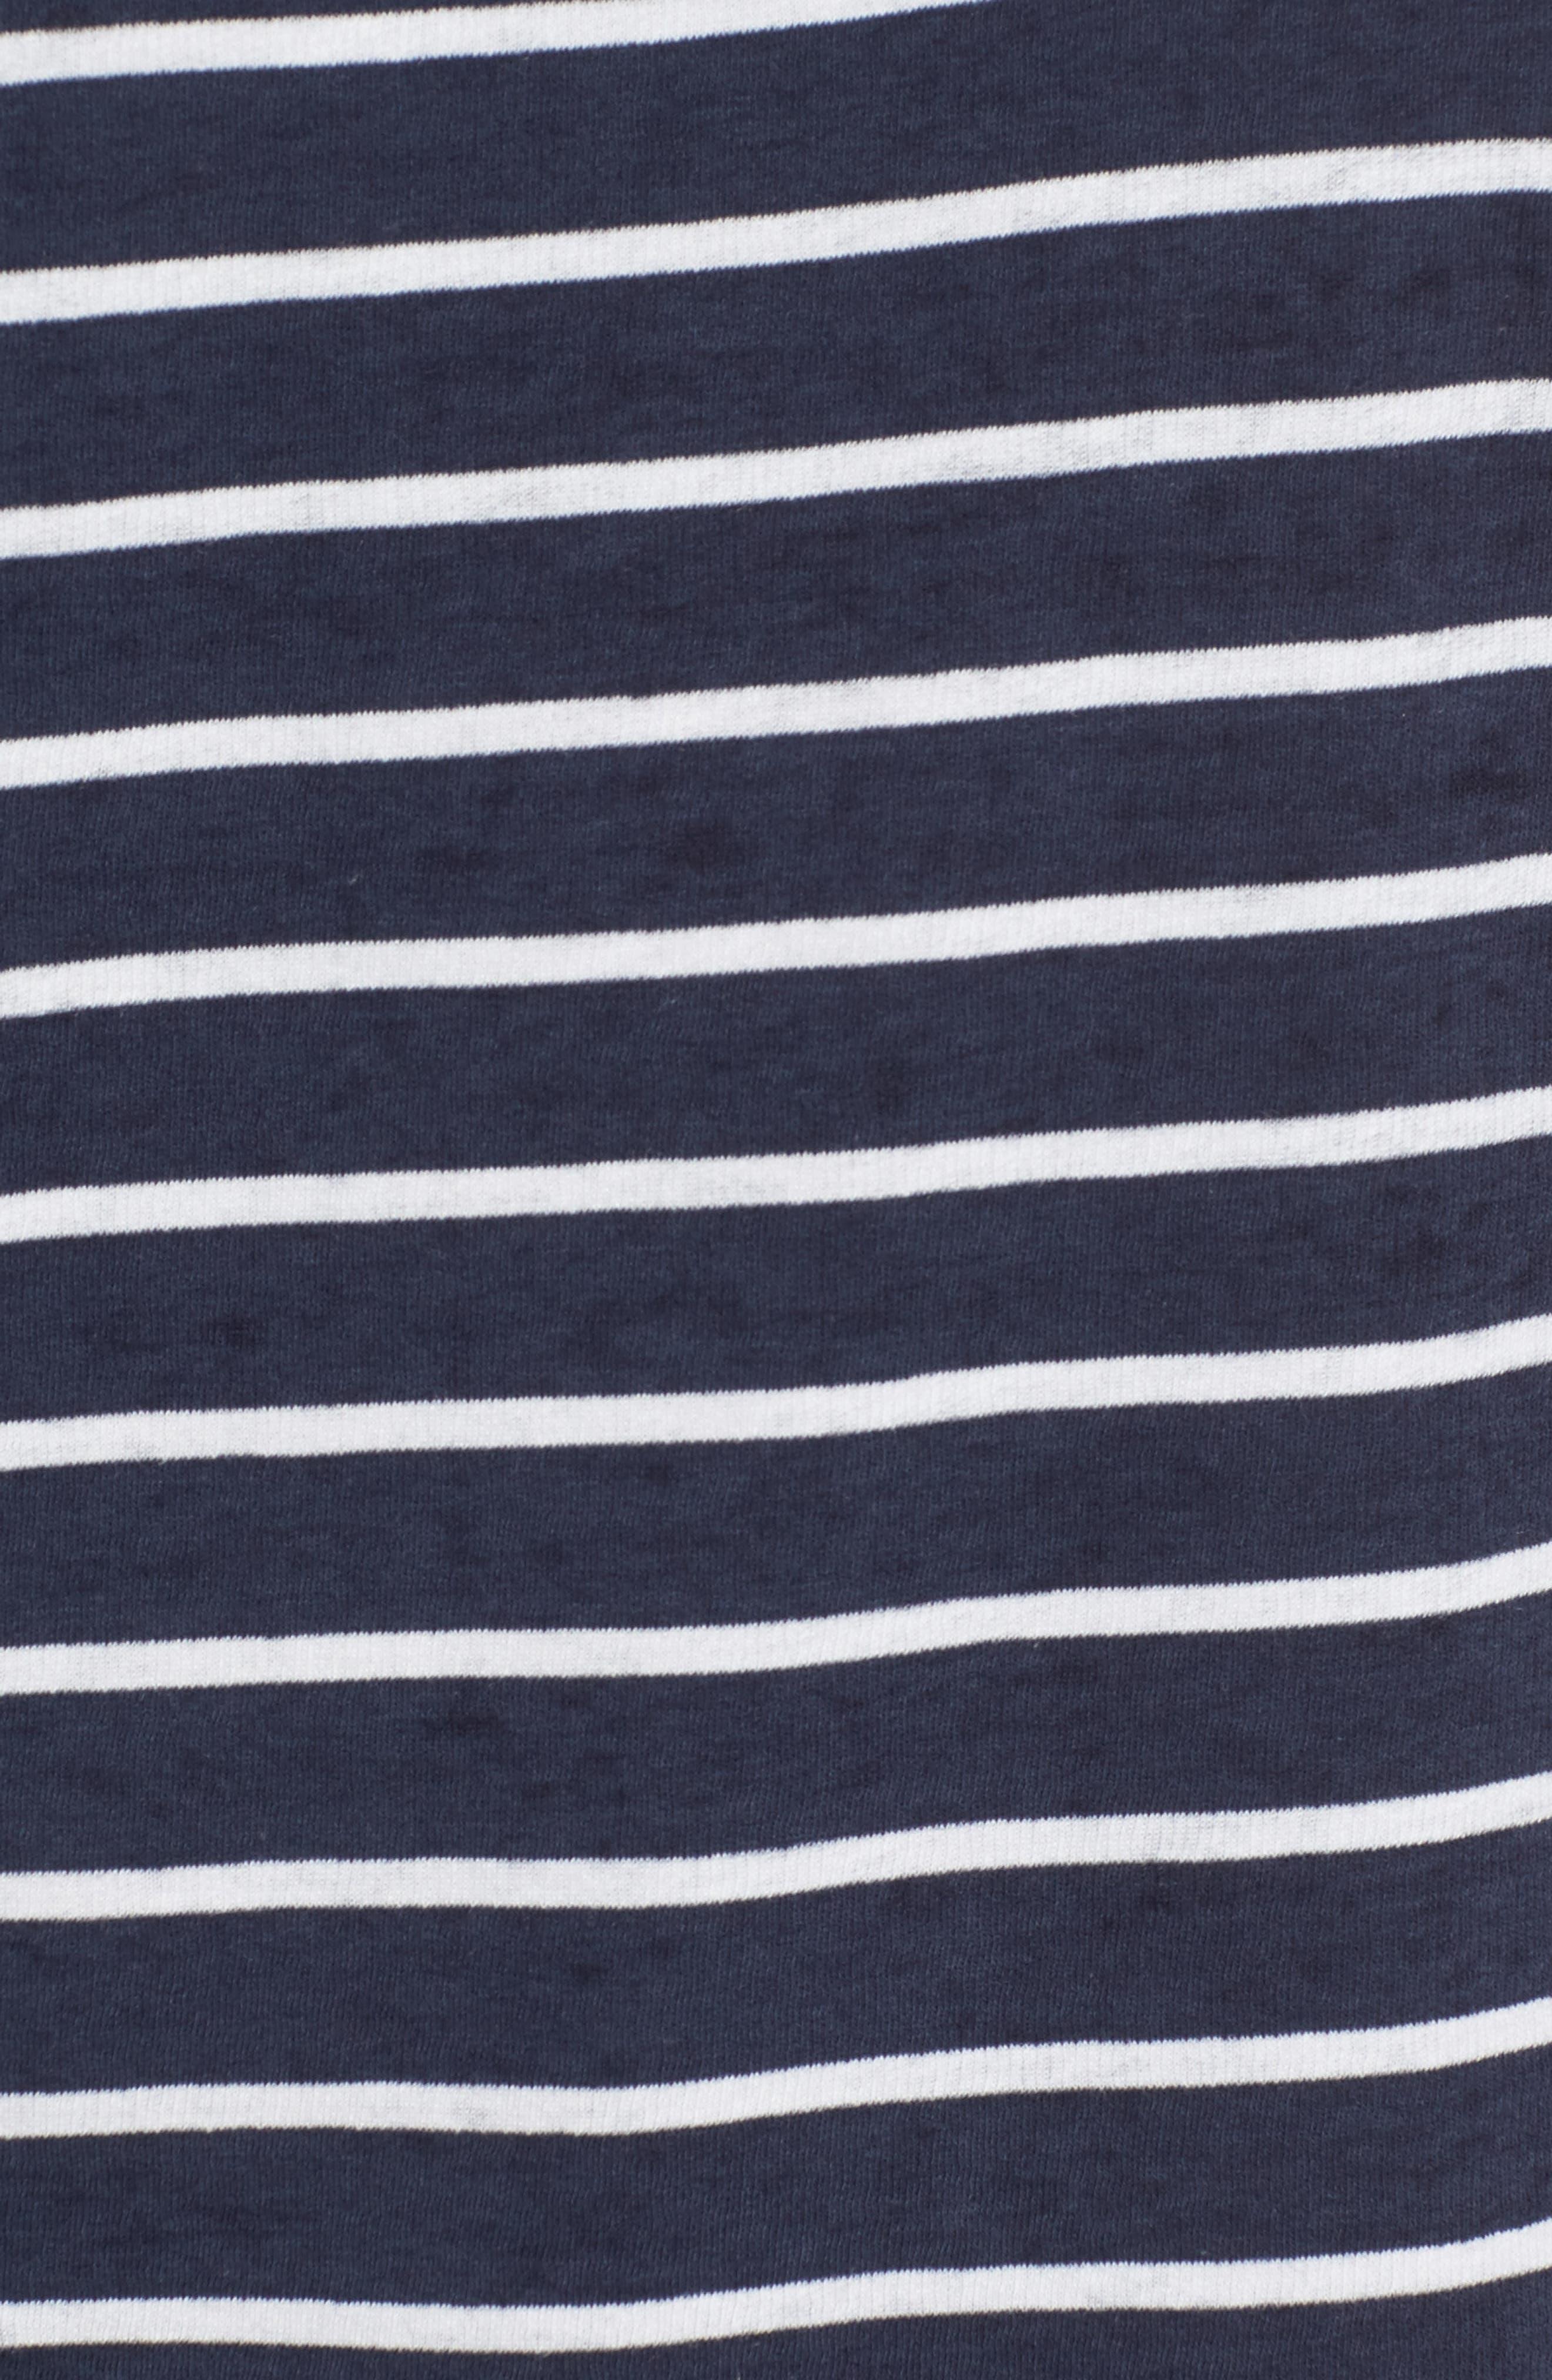 Bell Sleeve Sweatshirt,                             Alternate thumbnail 23, color,